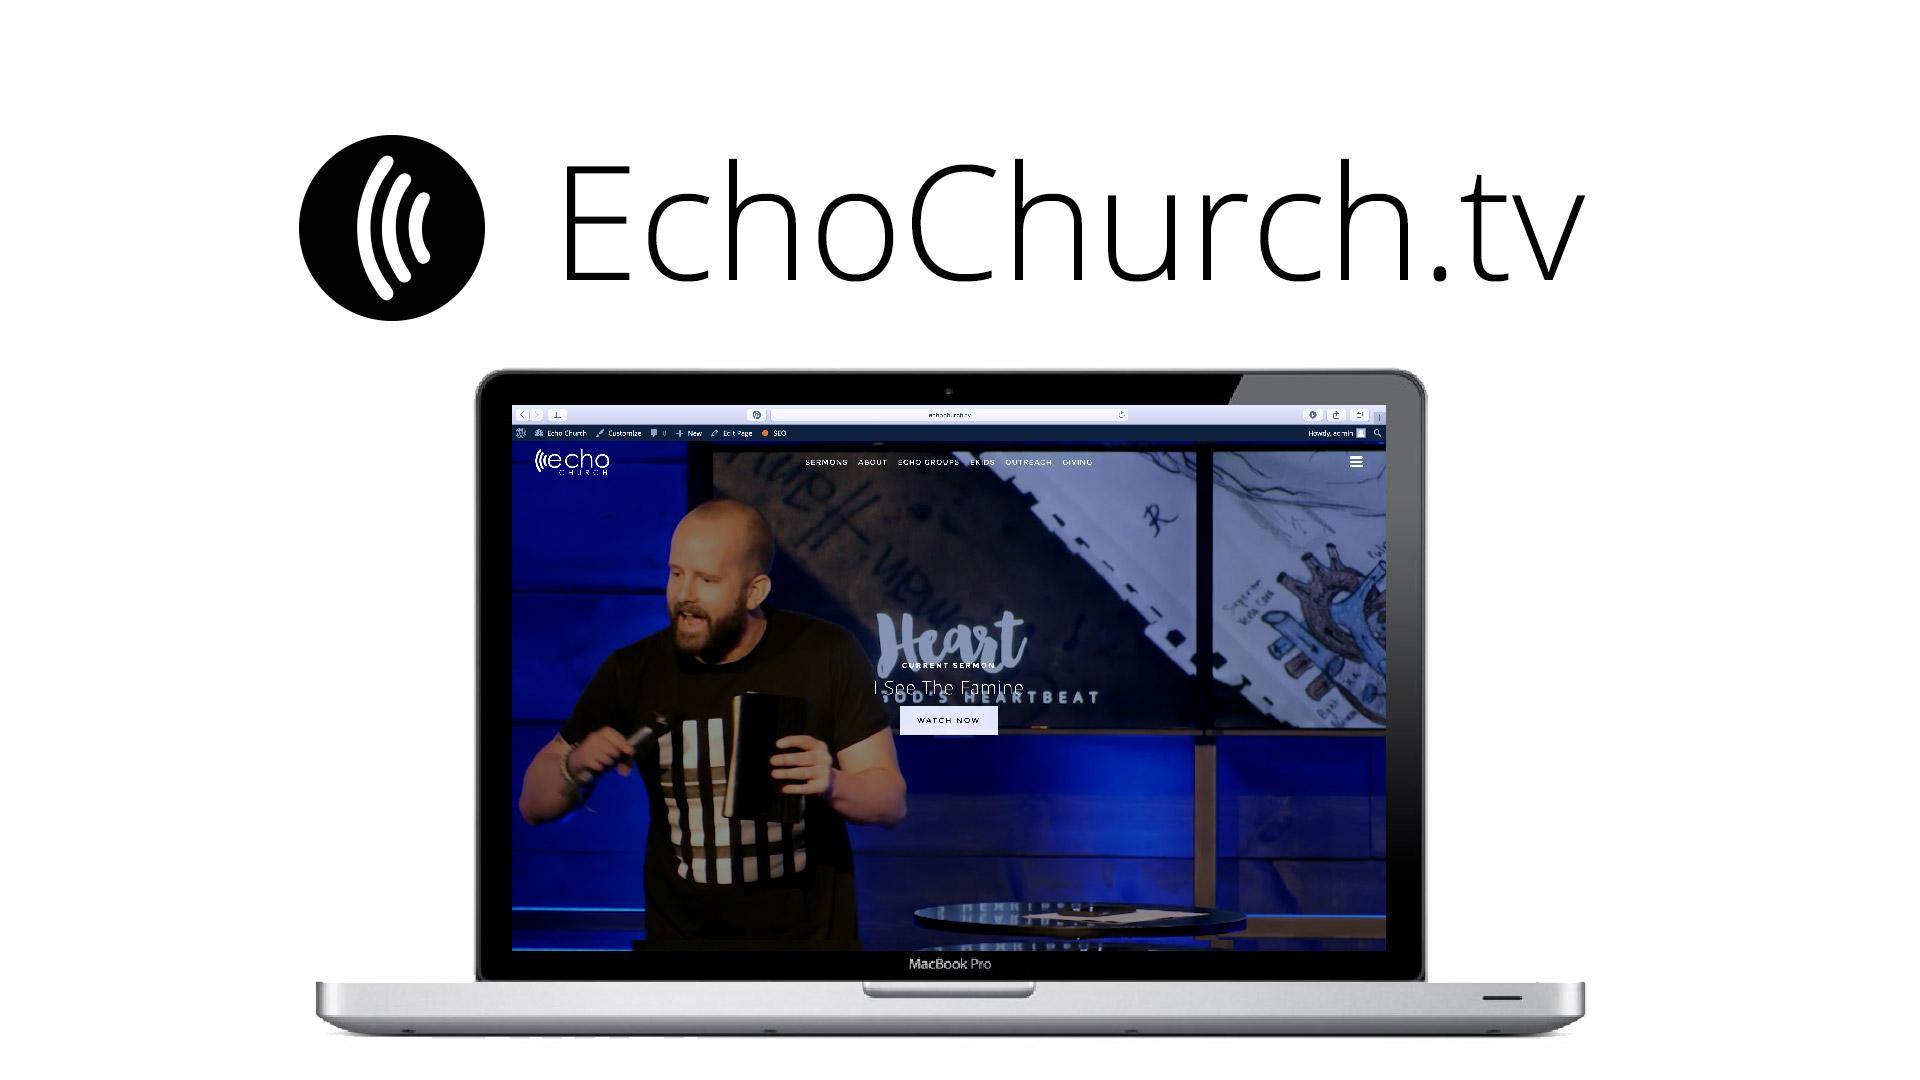 Echochurch.tv